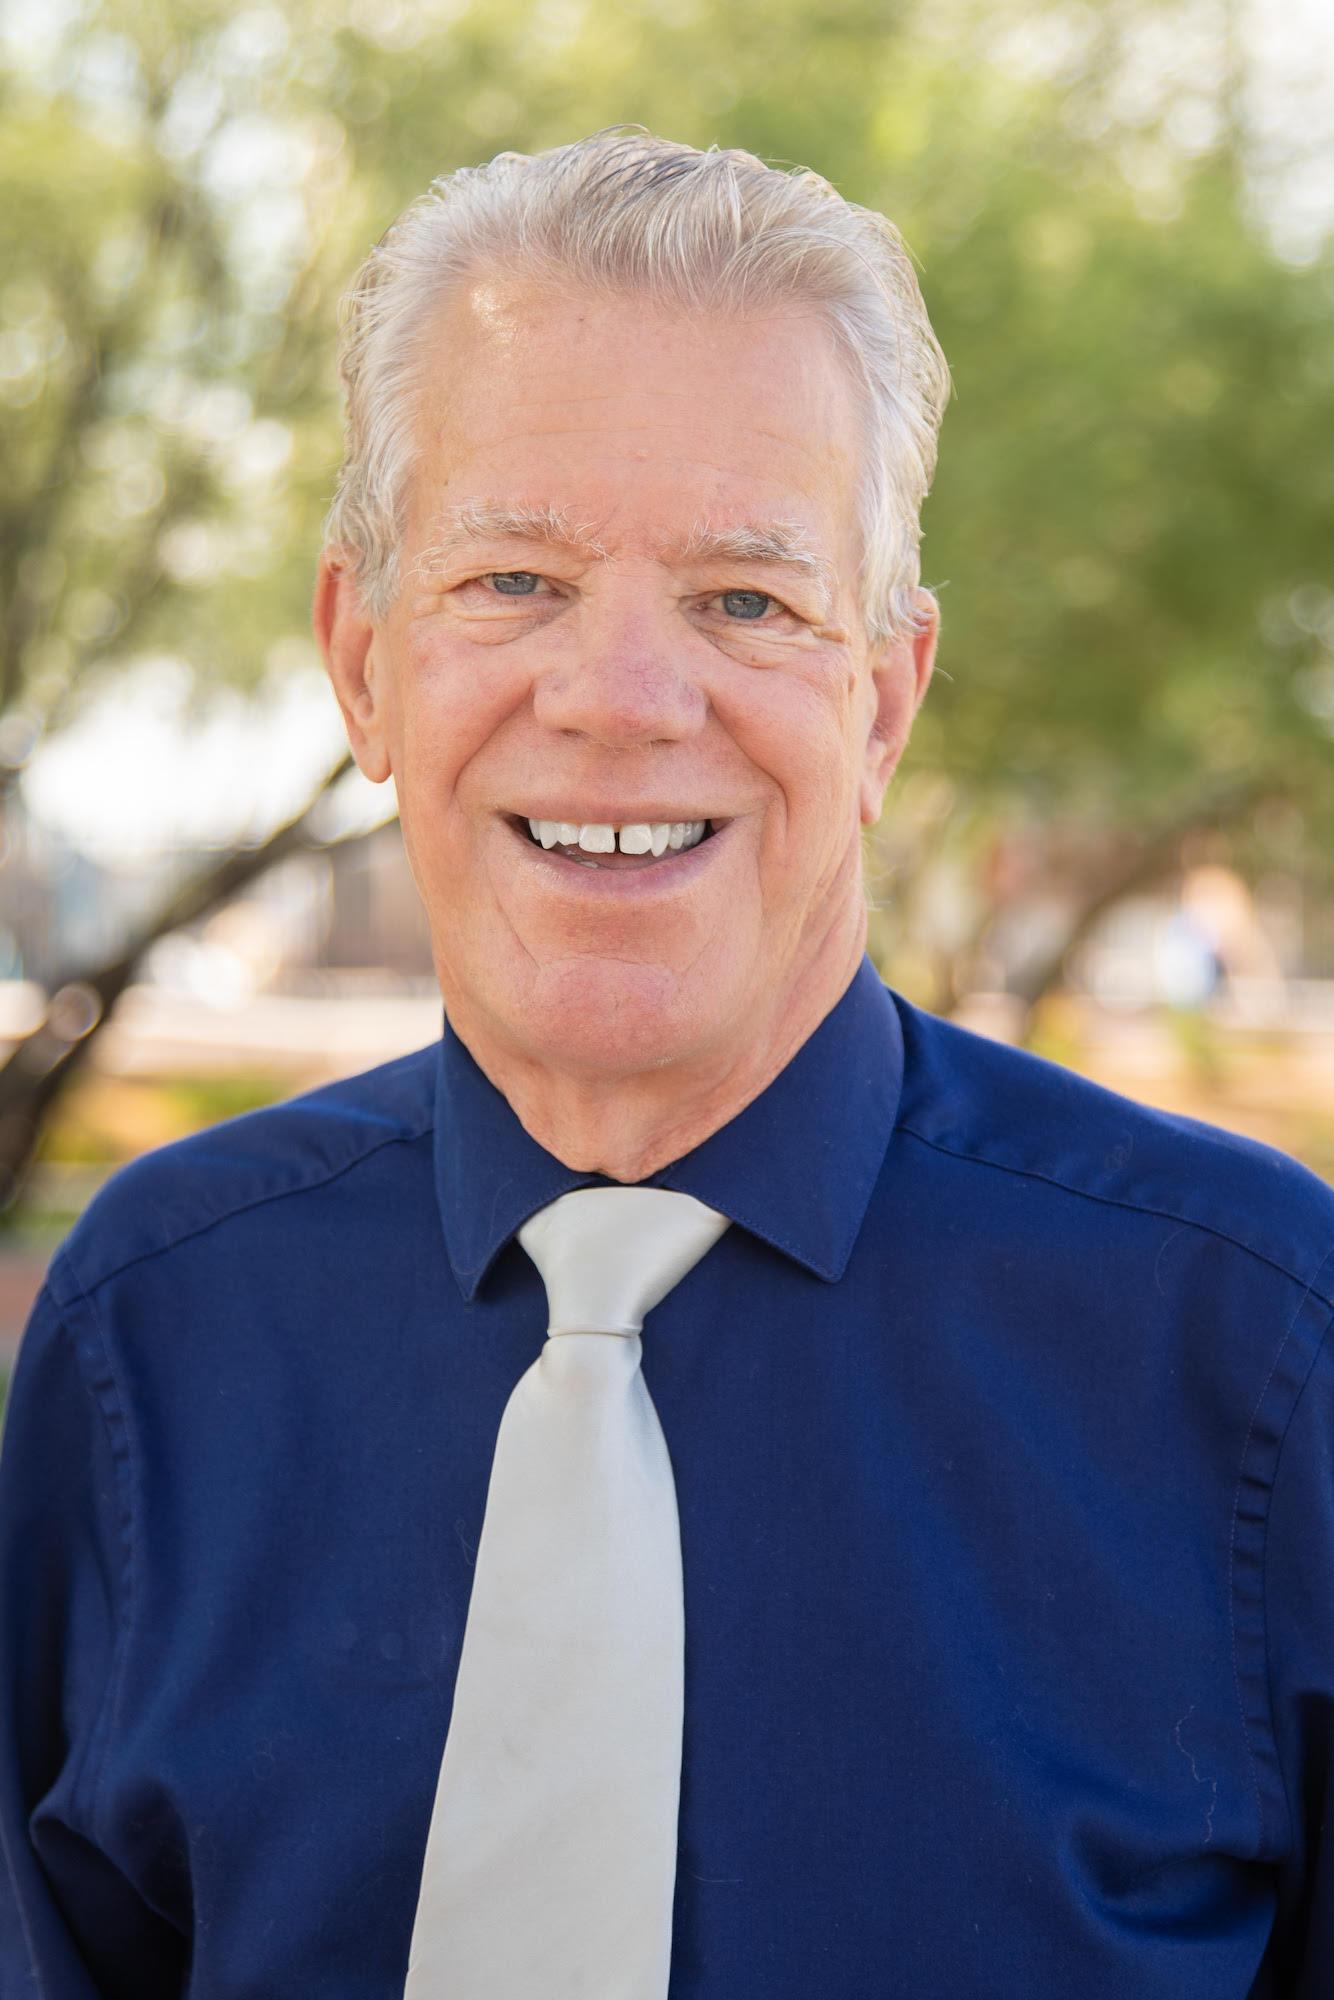 Robert Tompkins